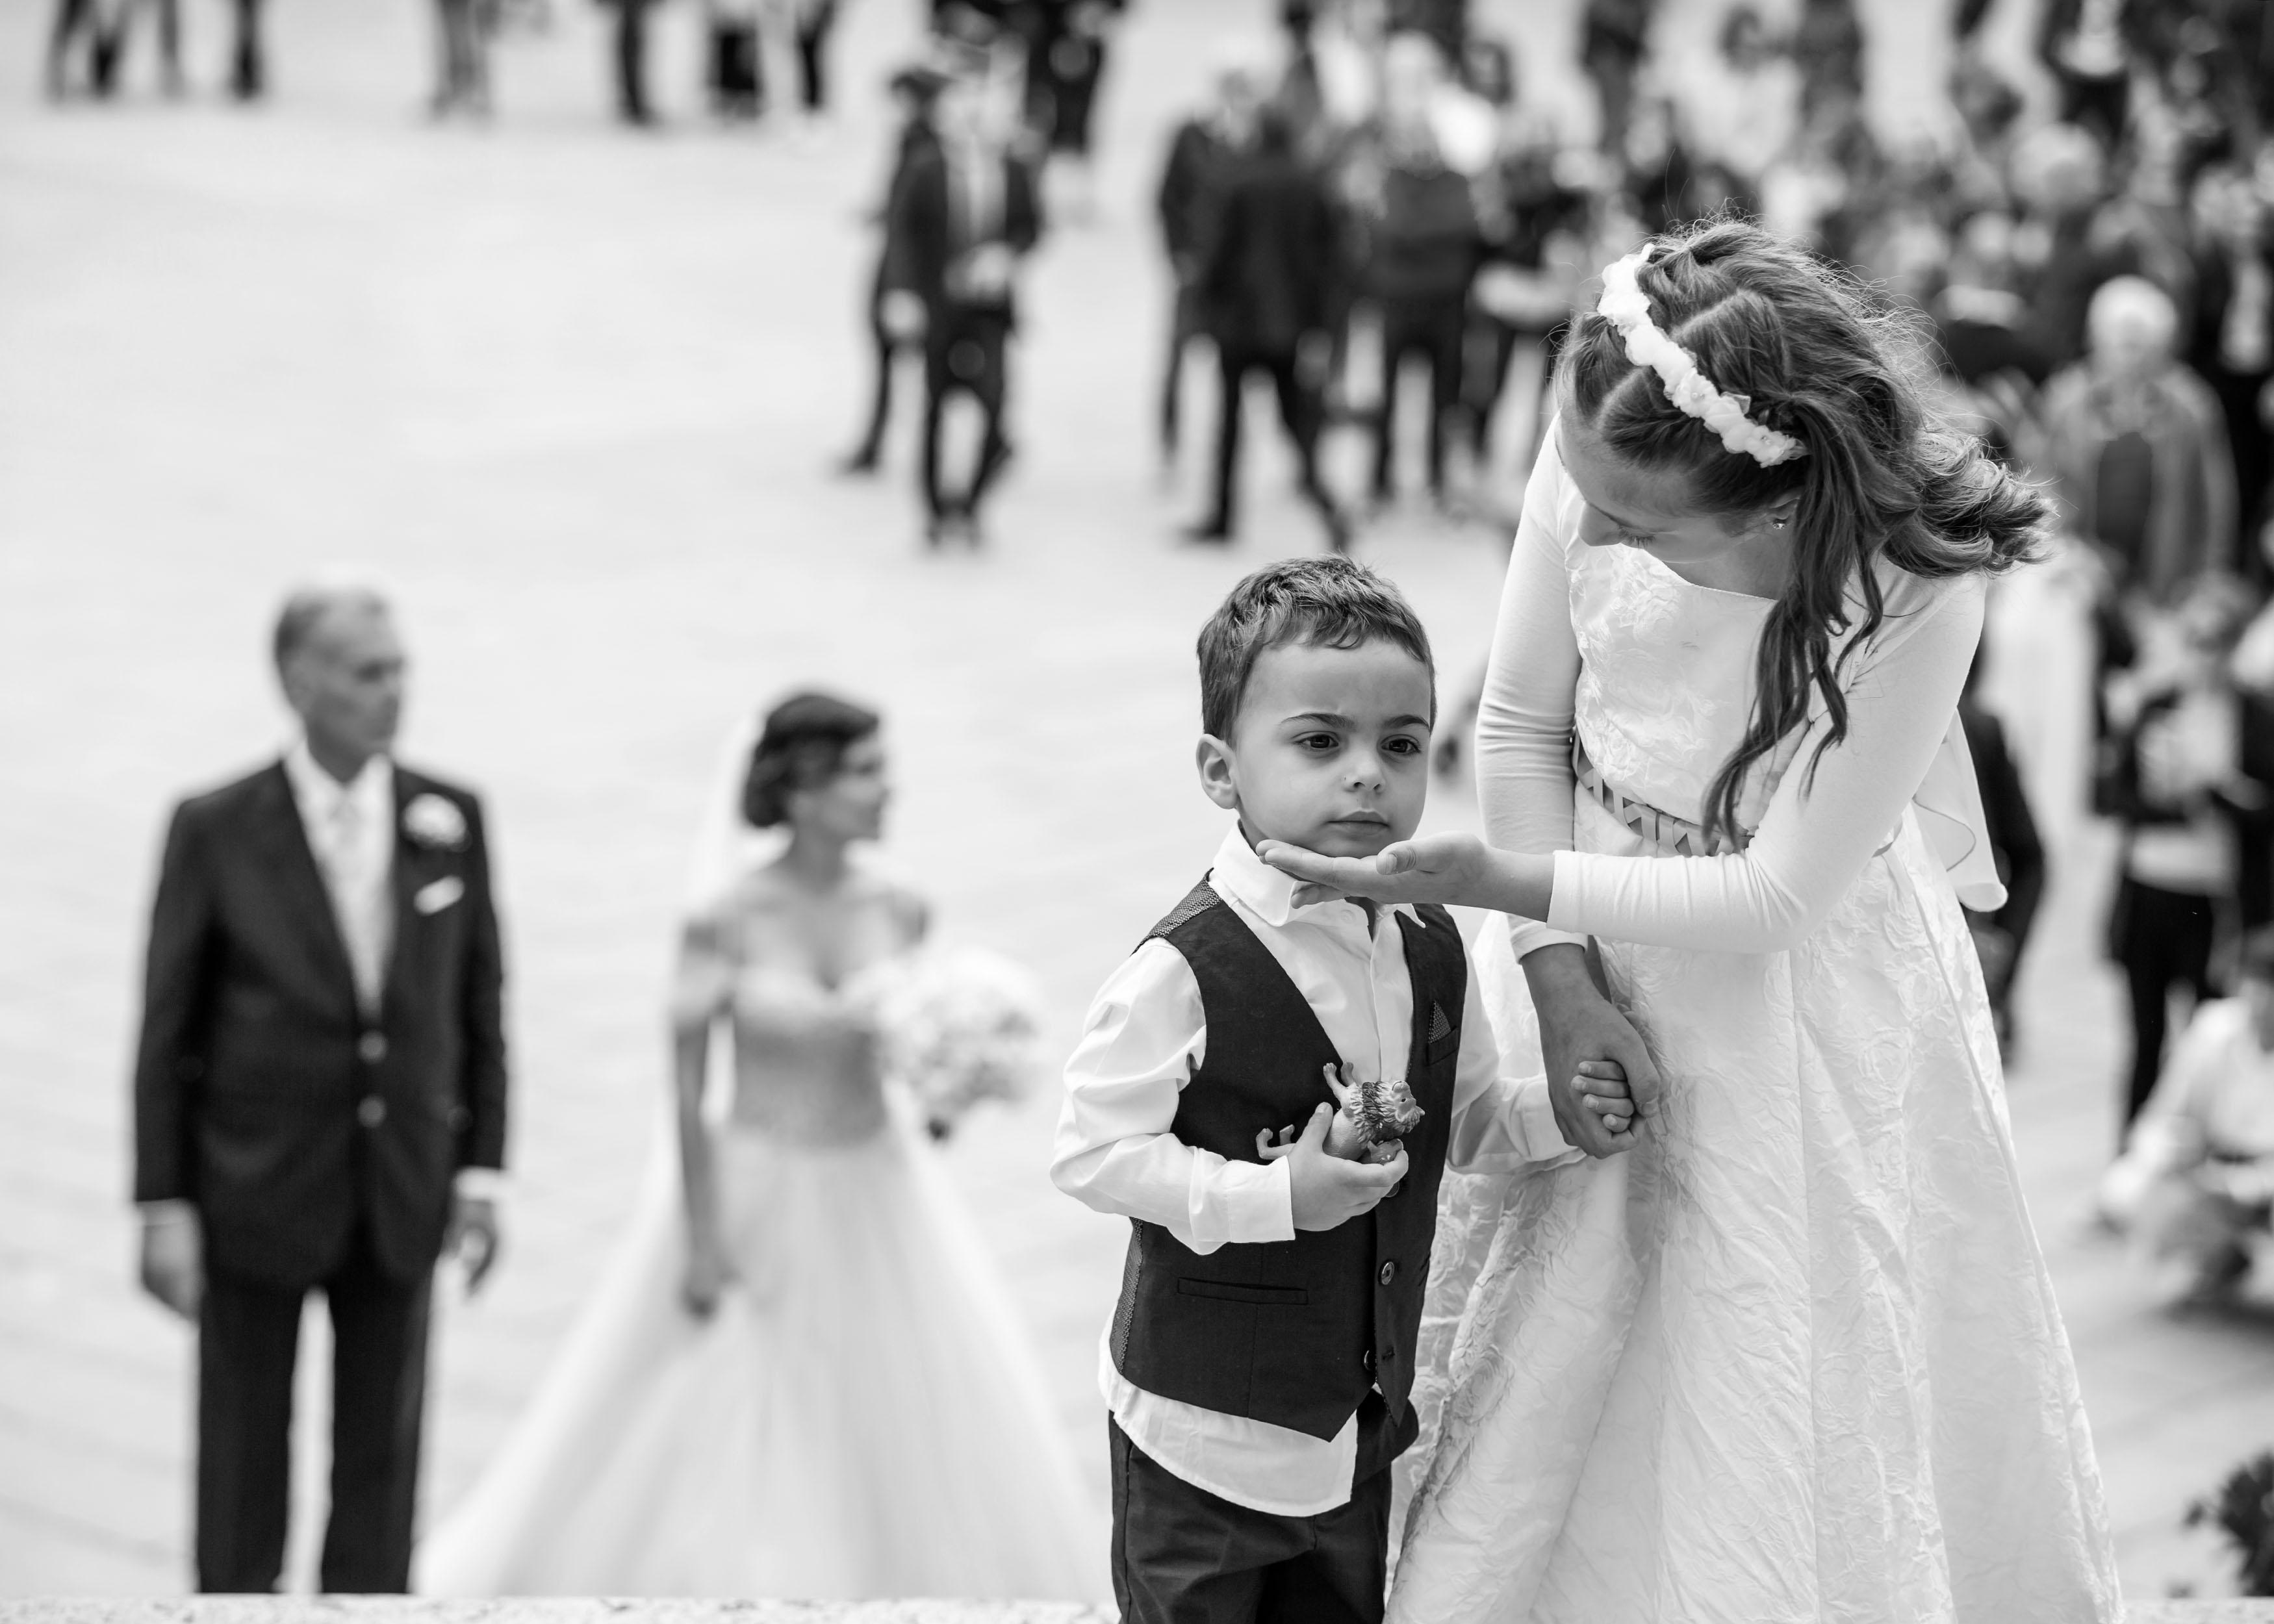 https://www.weddingamalfi.com/wp-content/uploads/Katia-Jorge-18-maggio-2019-23.jpg